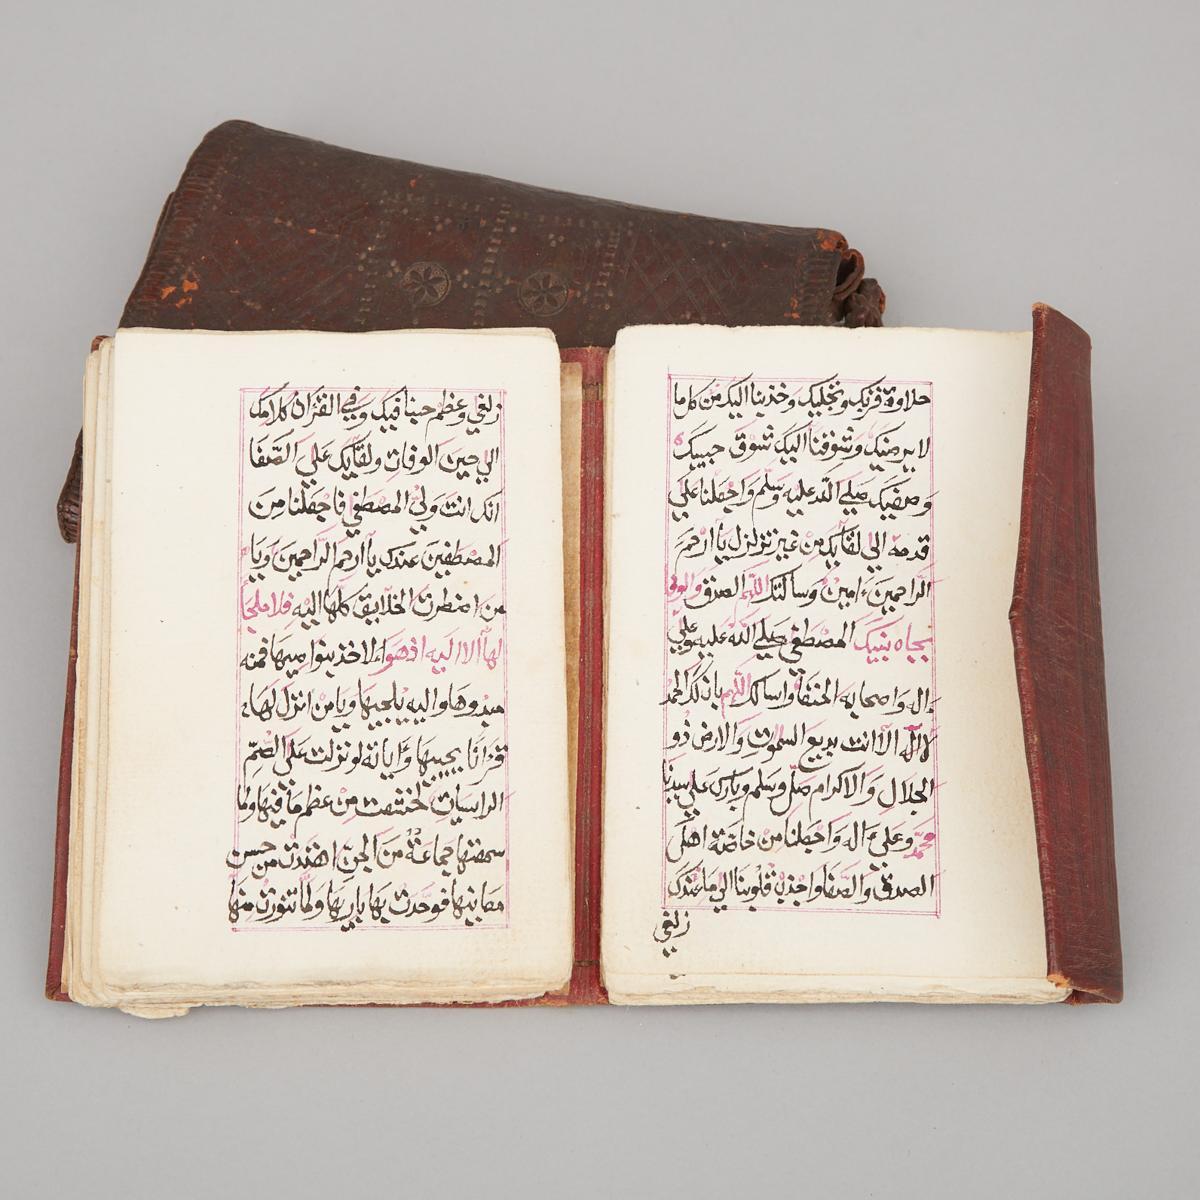 Islamic Prayer Manuscript, 19th century, 7 x 5.5 in — 17.8 x 14 cm - Image 4 of 6